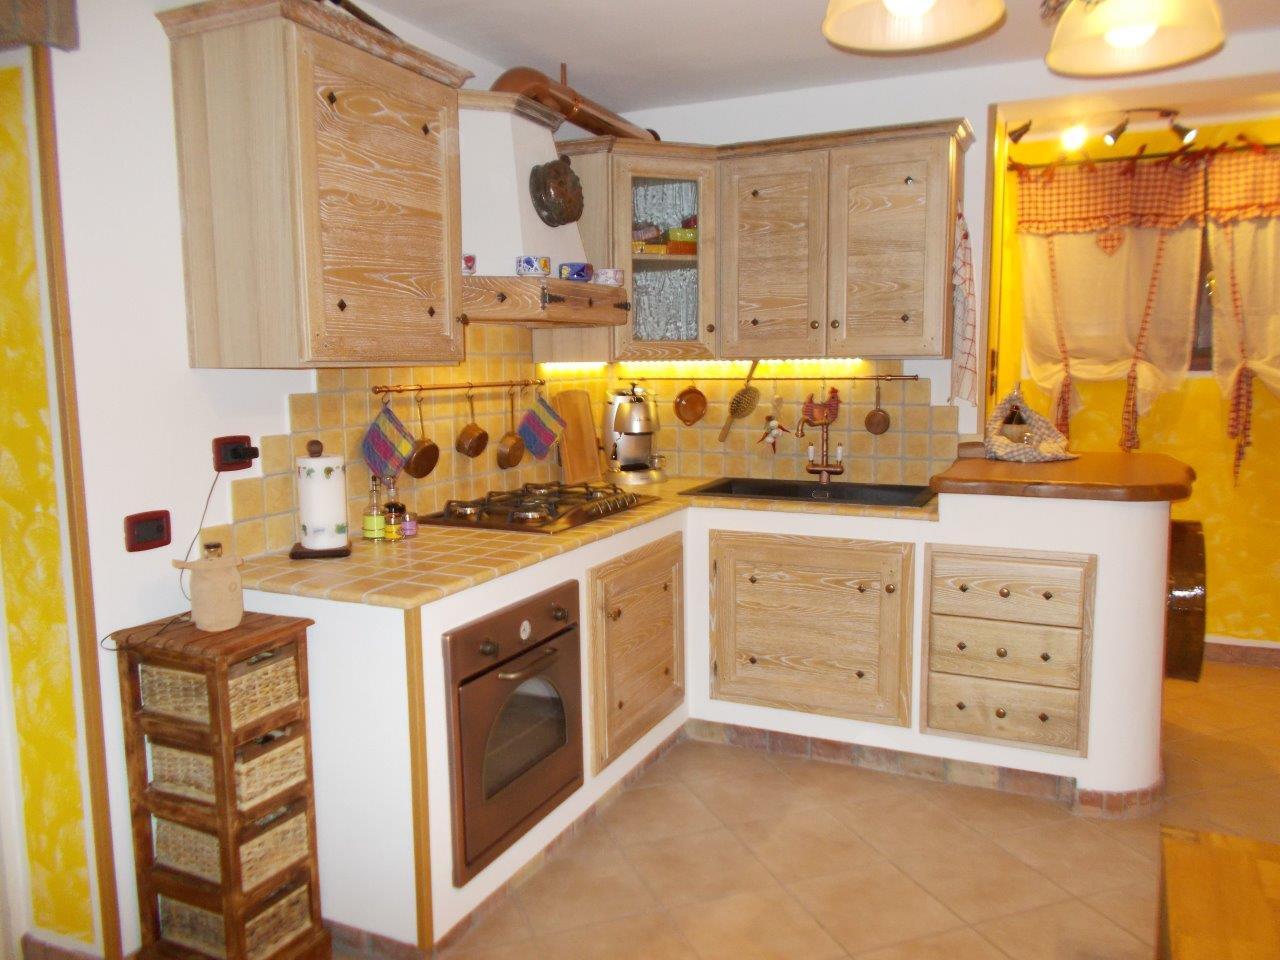 Cucine in finta muratura Archivi - Mobili GENTILINI